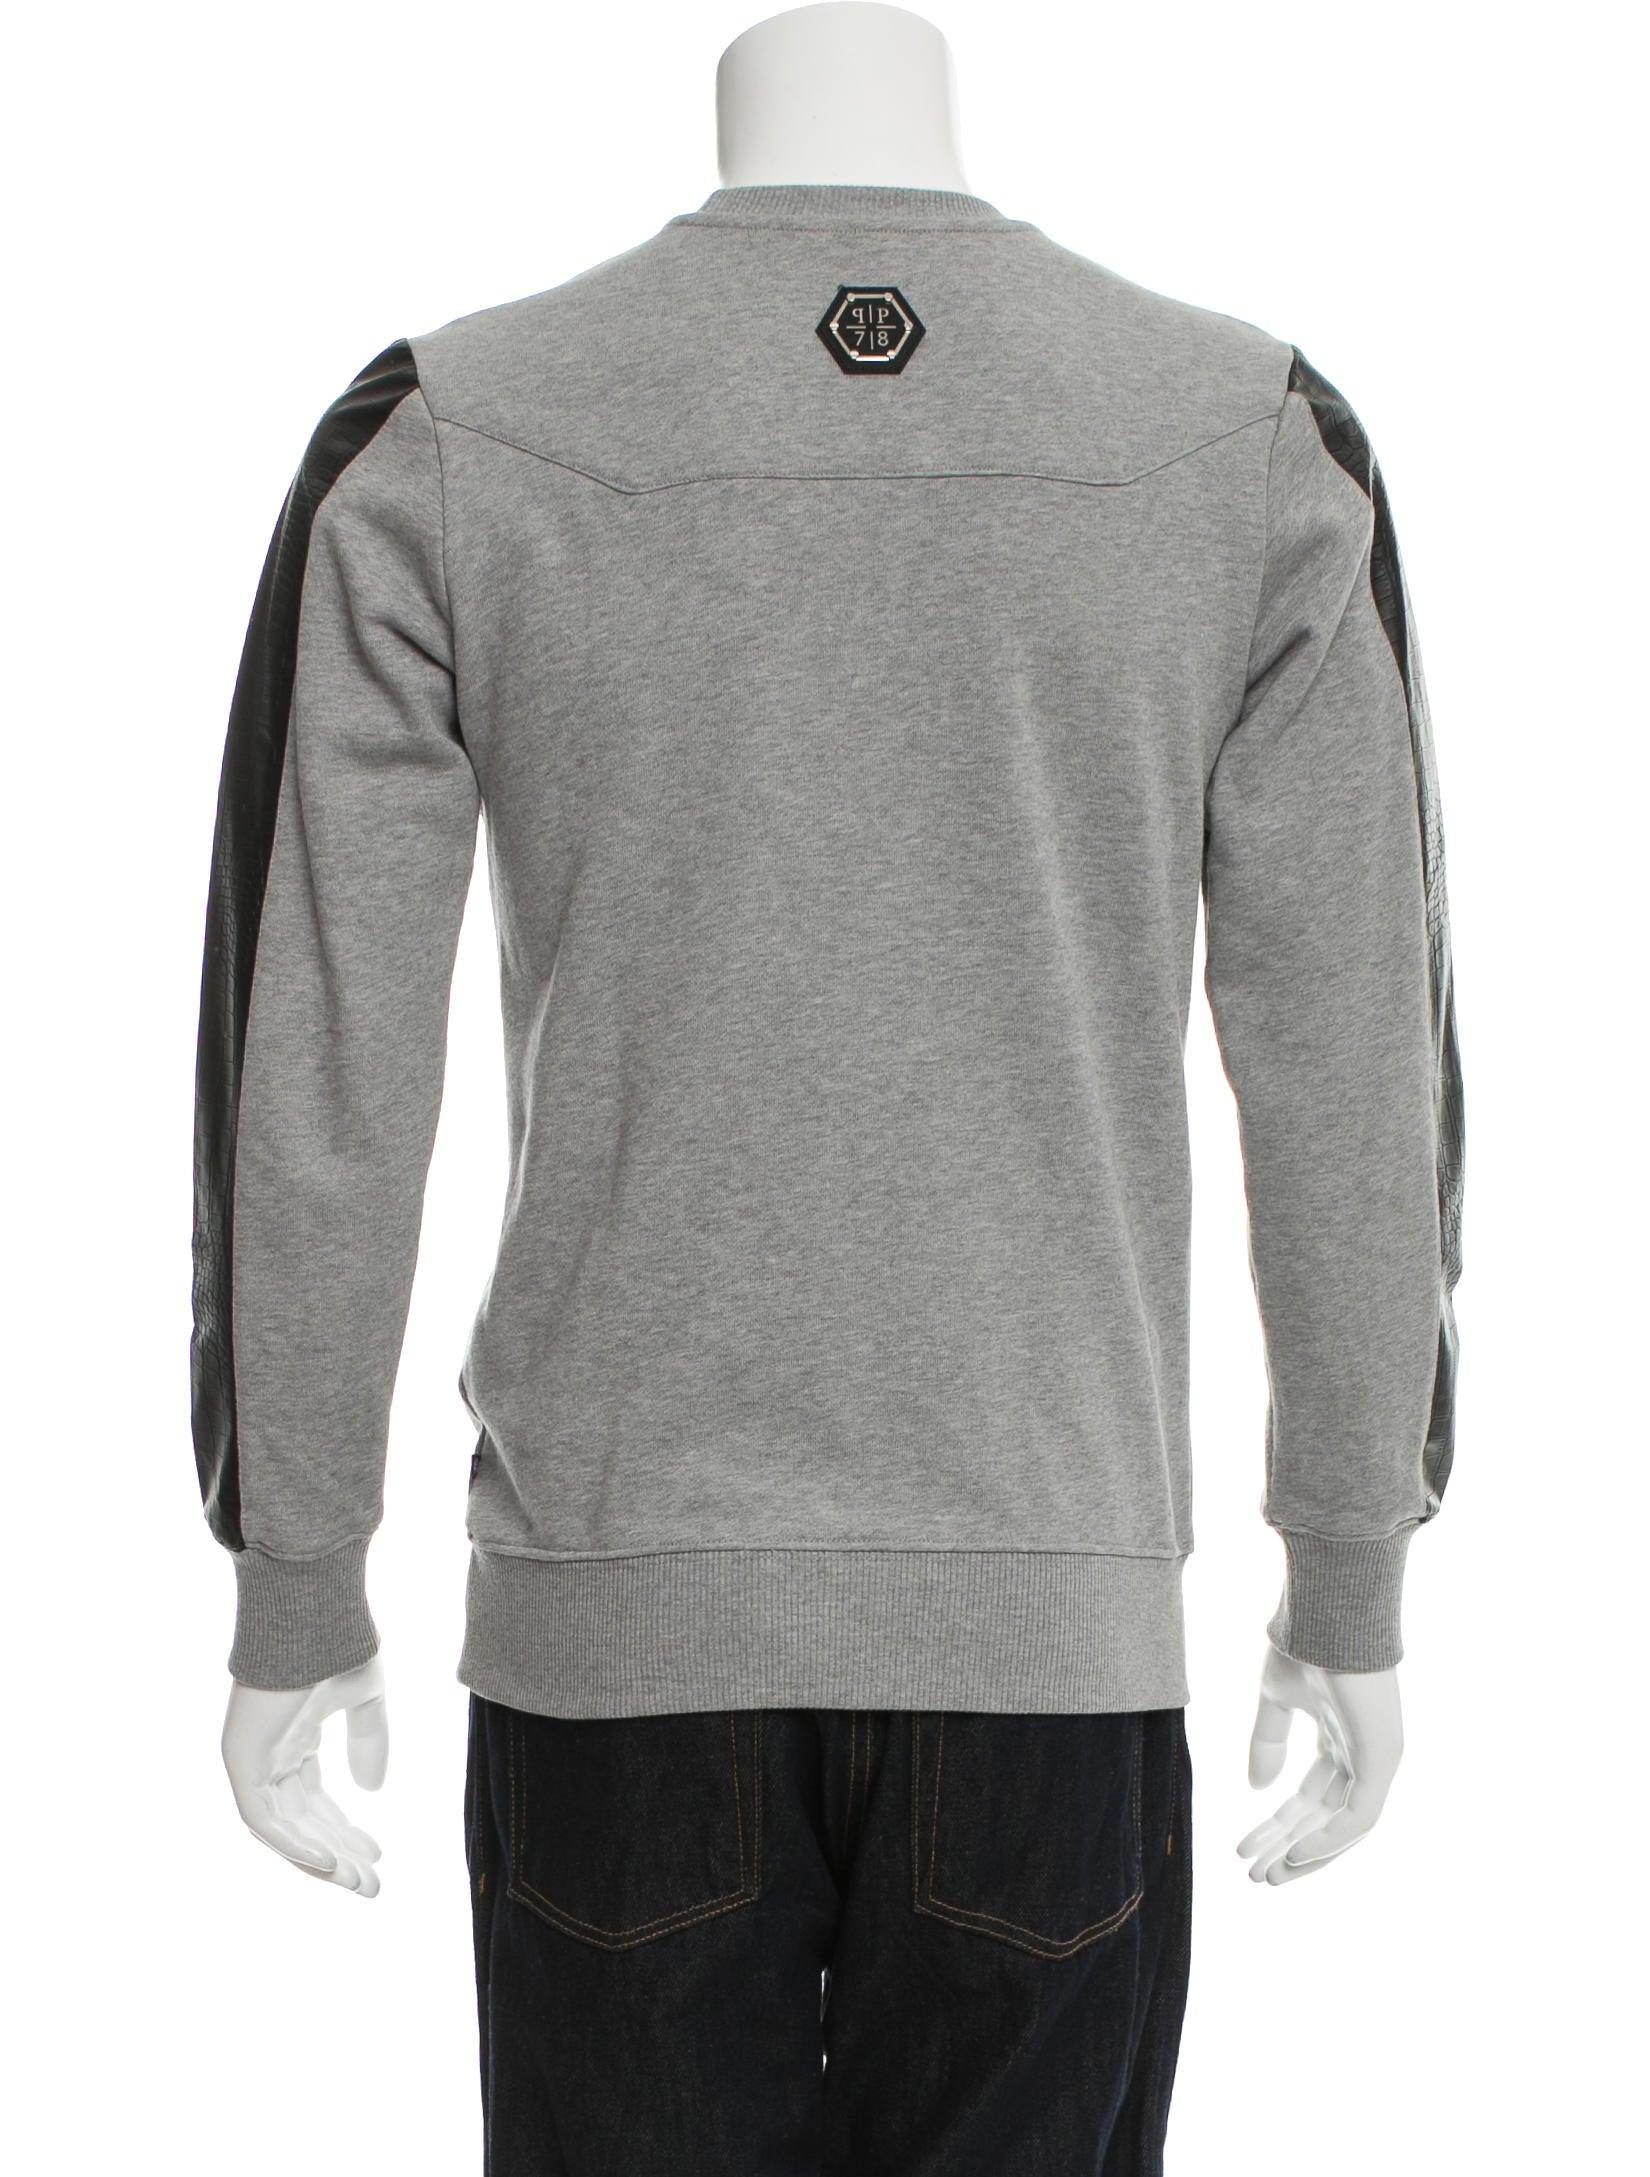 philipp plein embellished pullover sweatshirt clothing. Black Bedroom Furniture Sets. Home Design Ideas